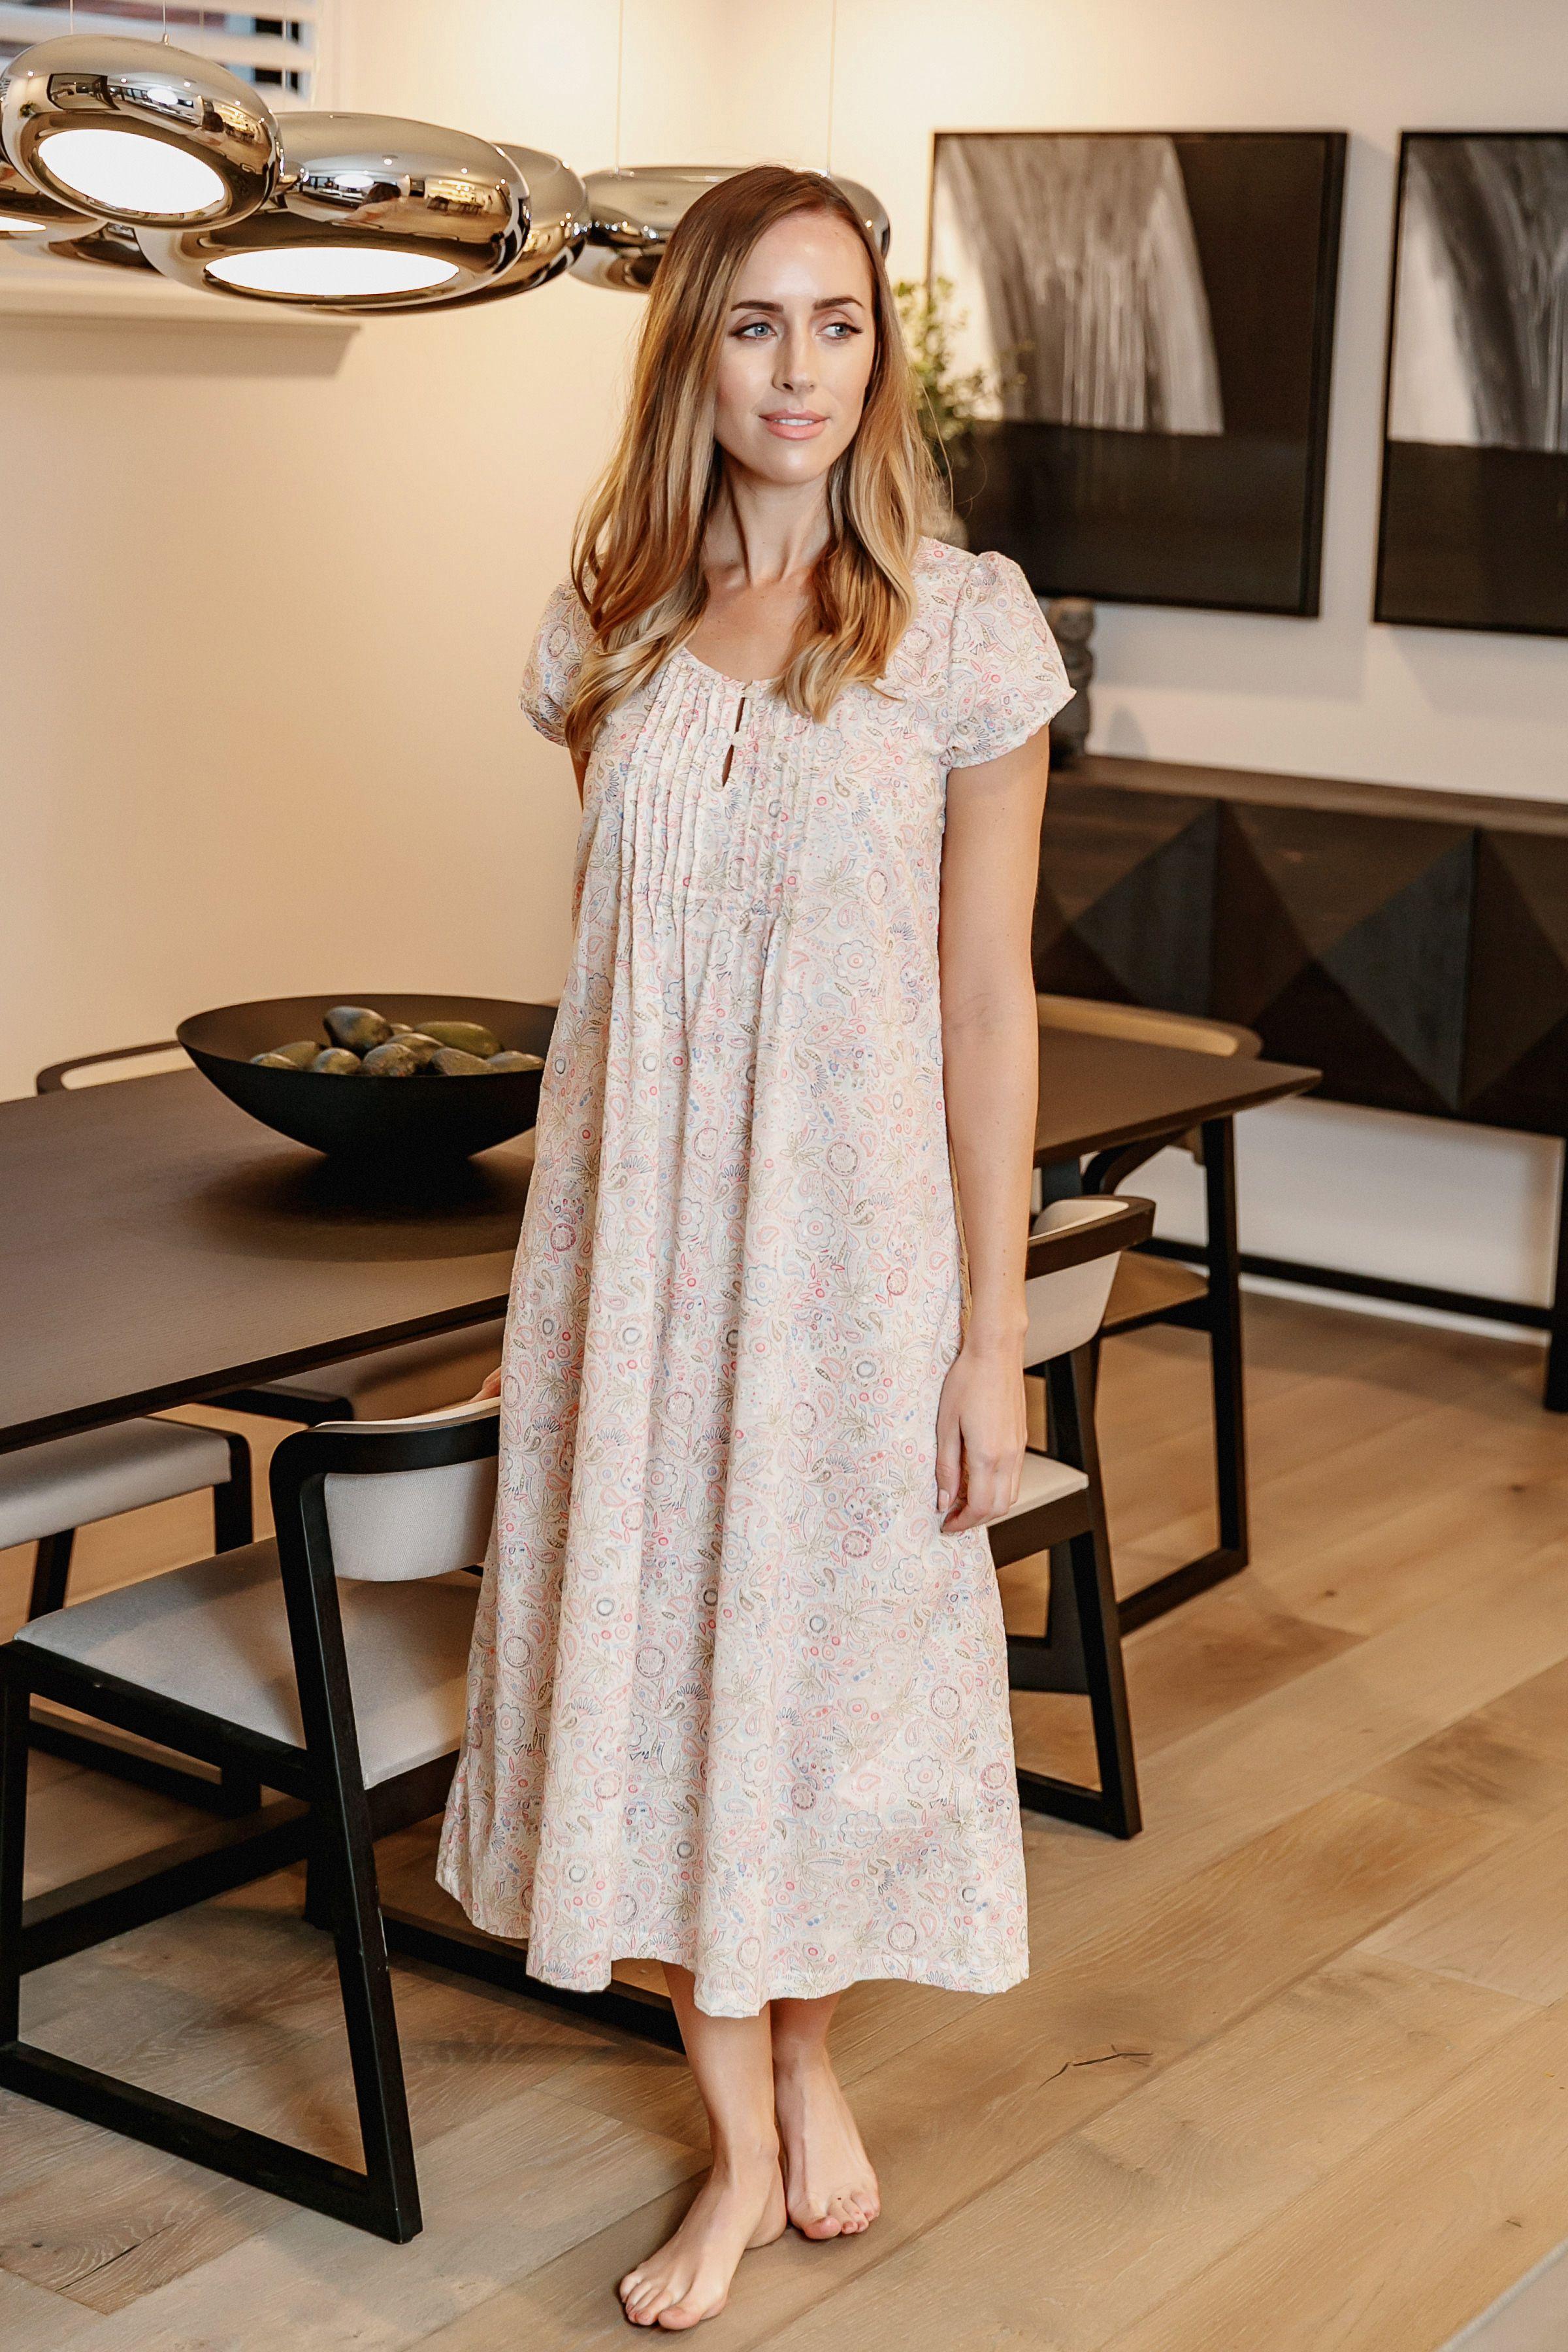 dbf267eb9e Ellie cotton cap sleeve nightie!   Pyjamas in 2019   Cap sleeves ...